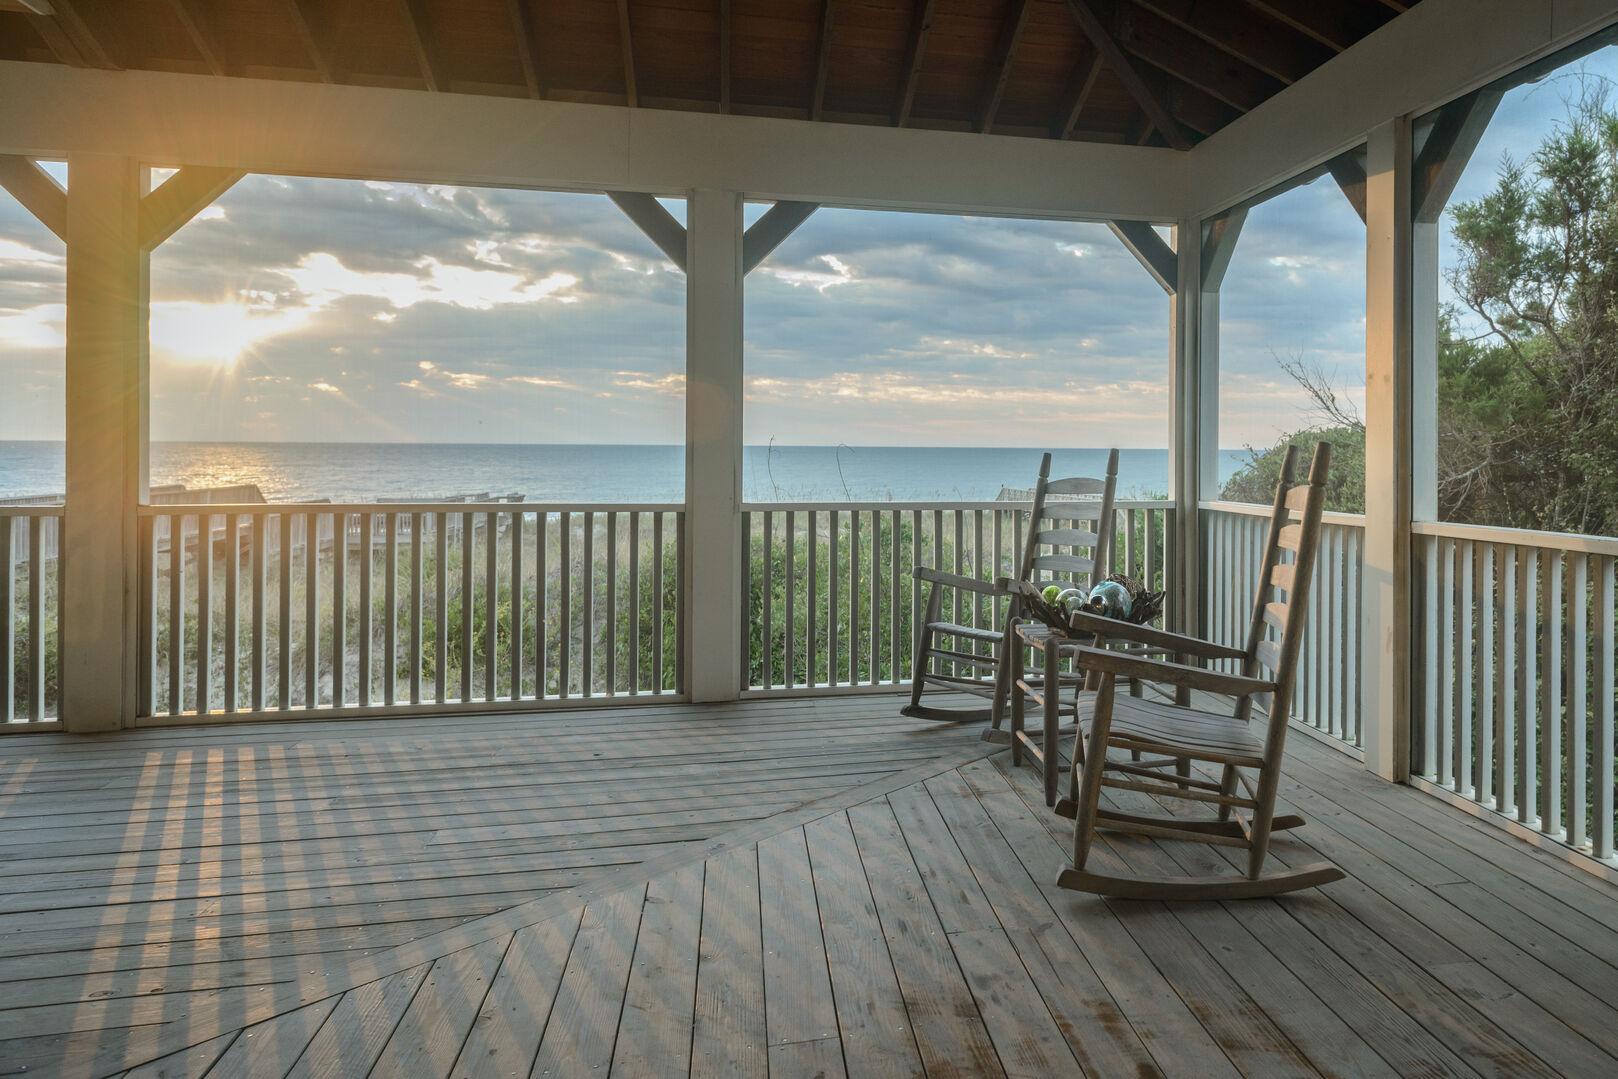 Oceanfront Porch